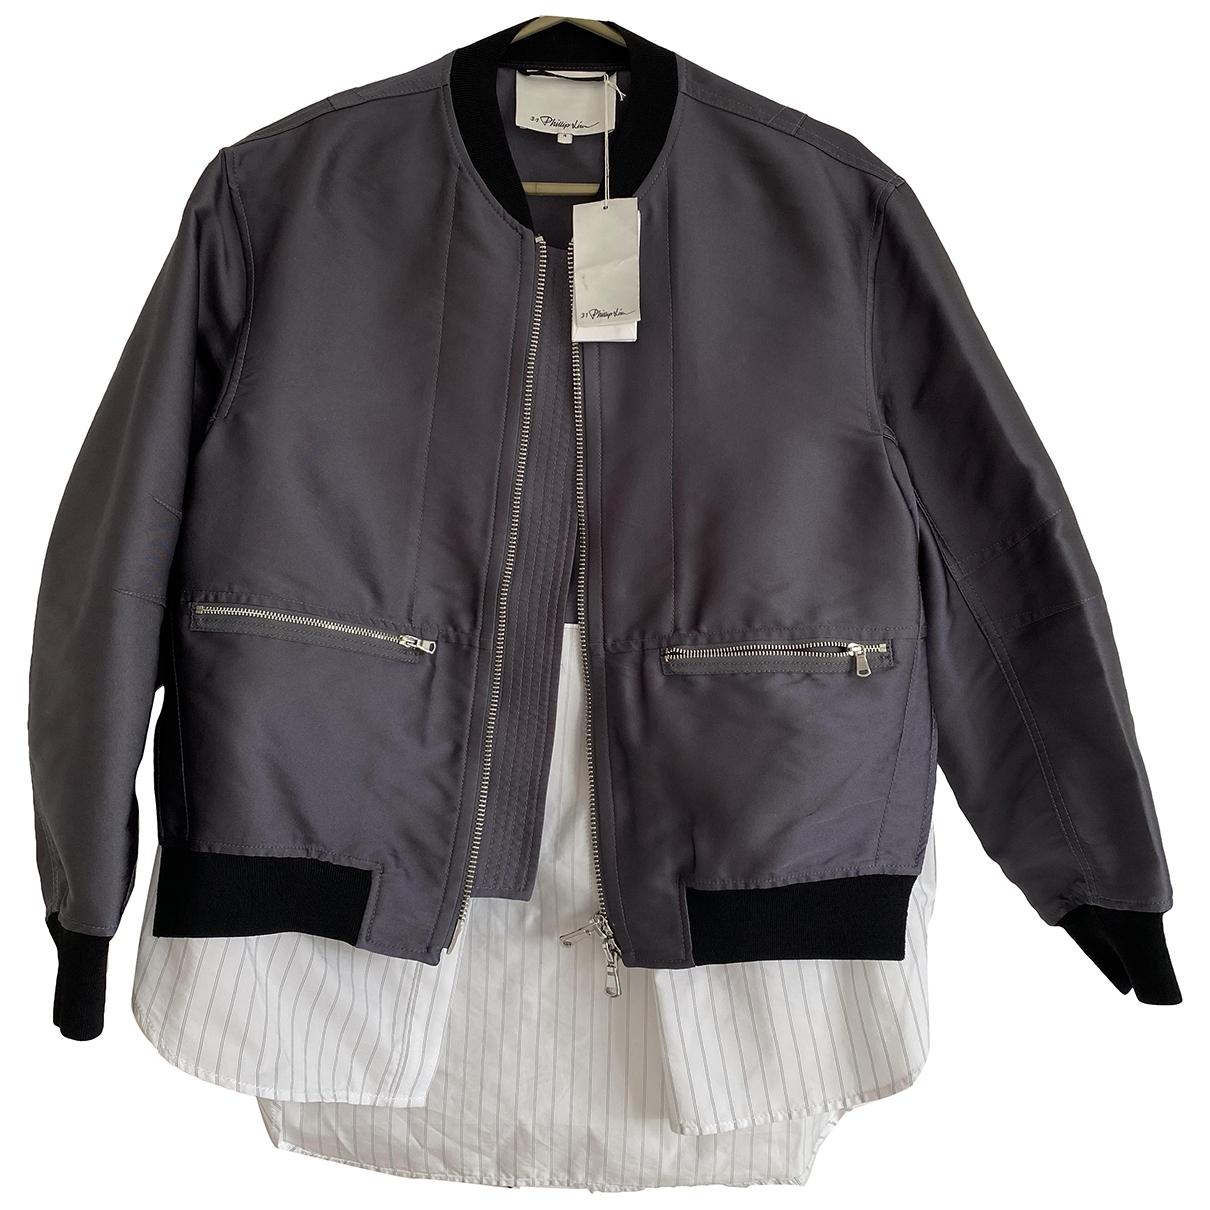 3.1 Phillip Lim \N Grey jacket for Women 4 US